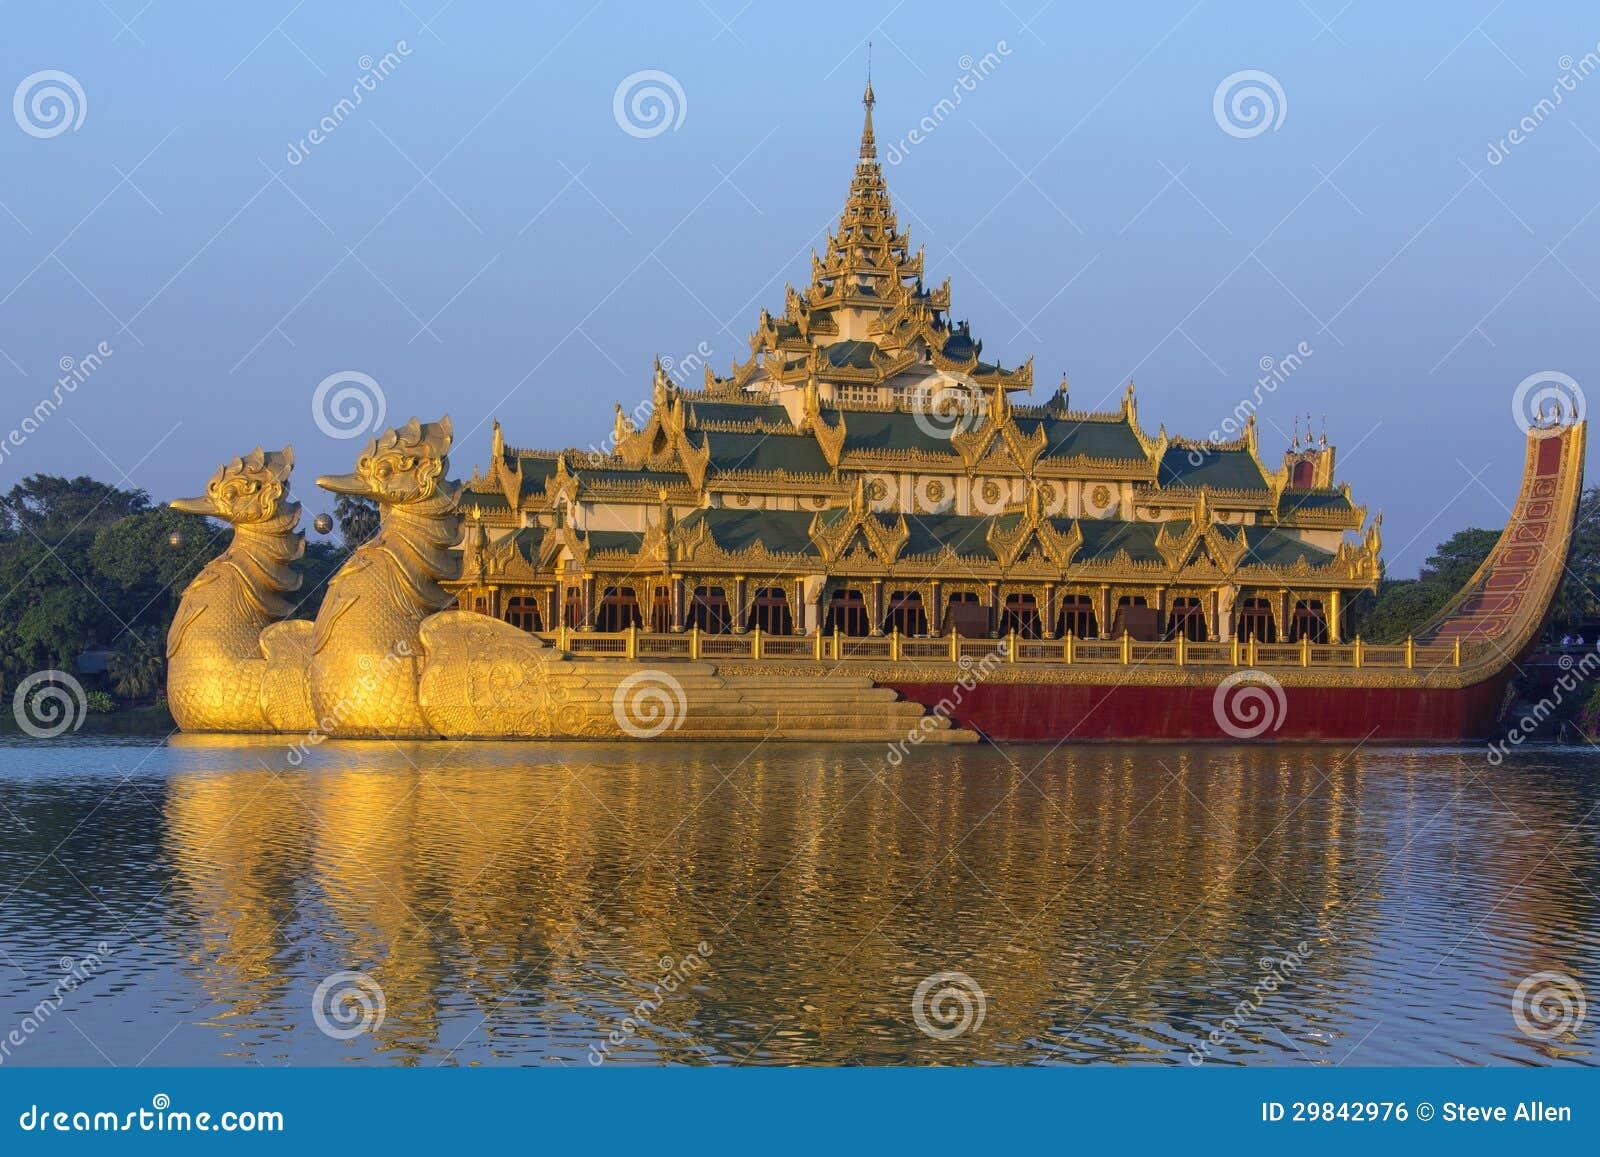 karaweik是一艘缅甸皇家驳船的复制品在kandawgyi湖的在缅甸的仰光.